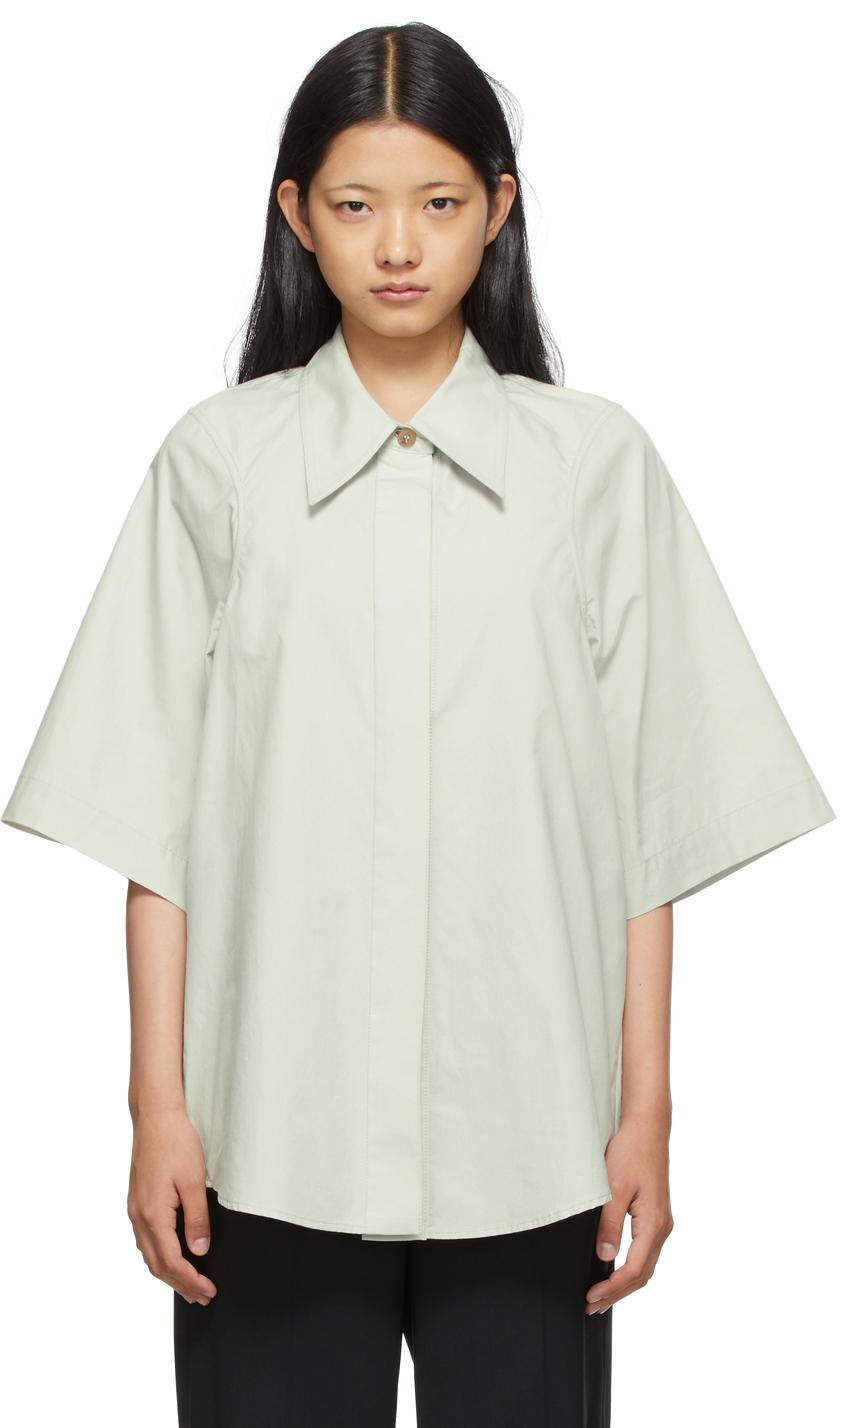 SSENSE Exclusive Taupe Armhole Stitch Short Sleeve Shirt